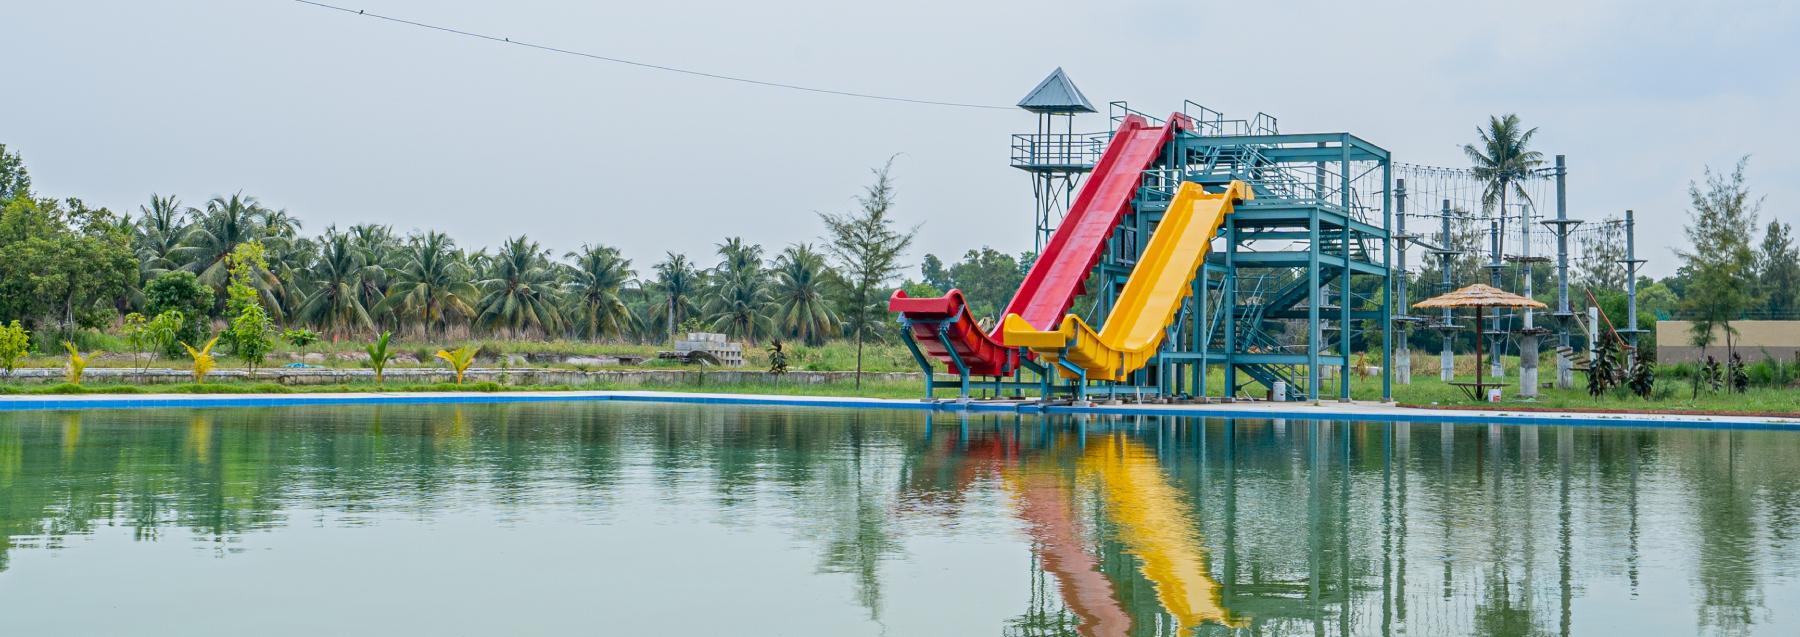 facitity waterslide water park desaru johor malaysia